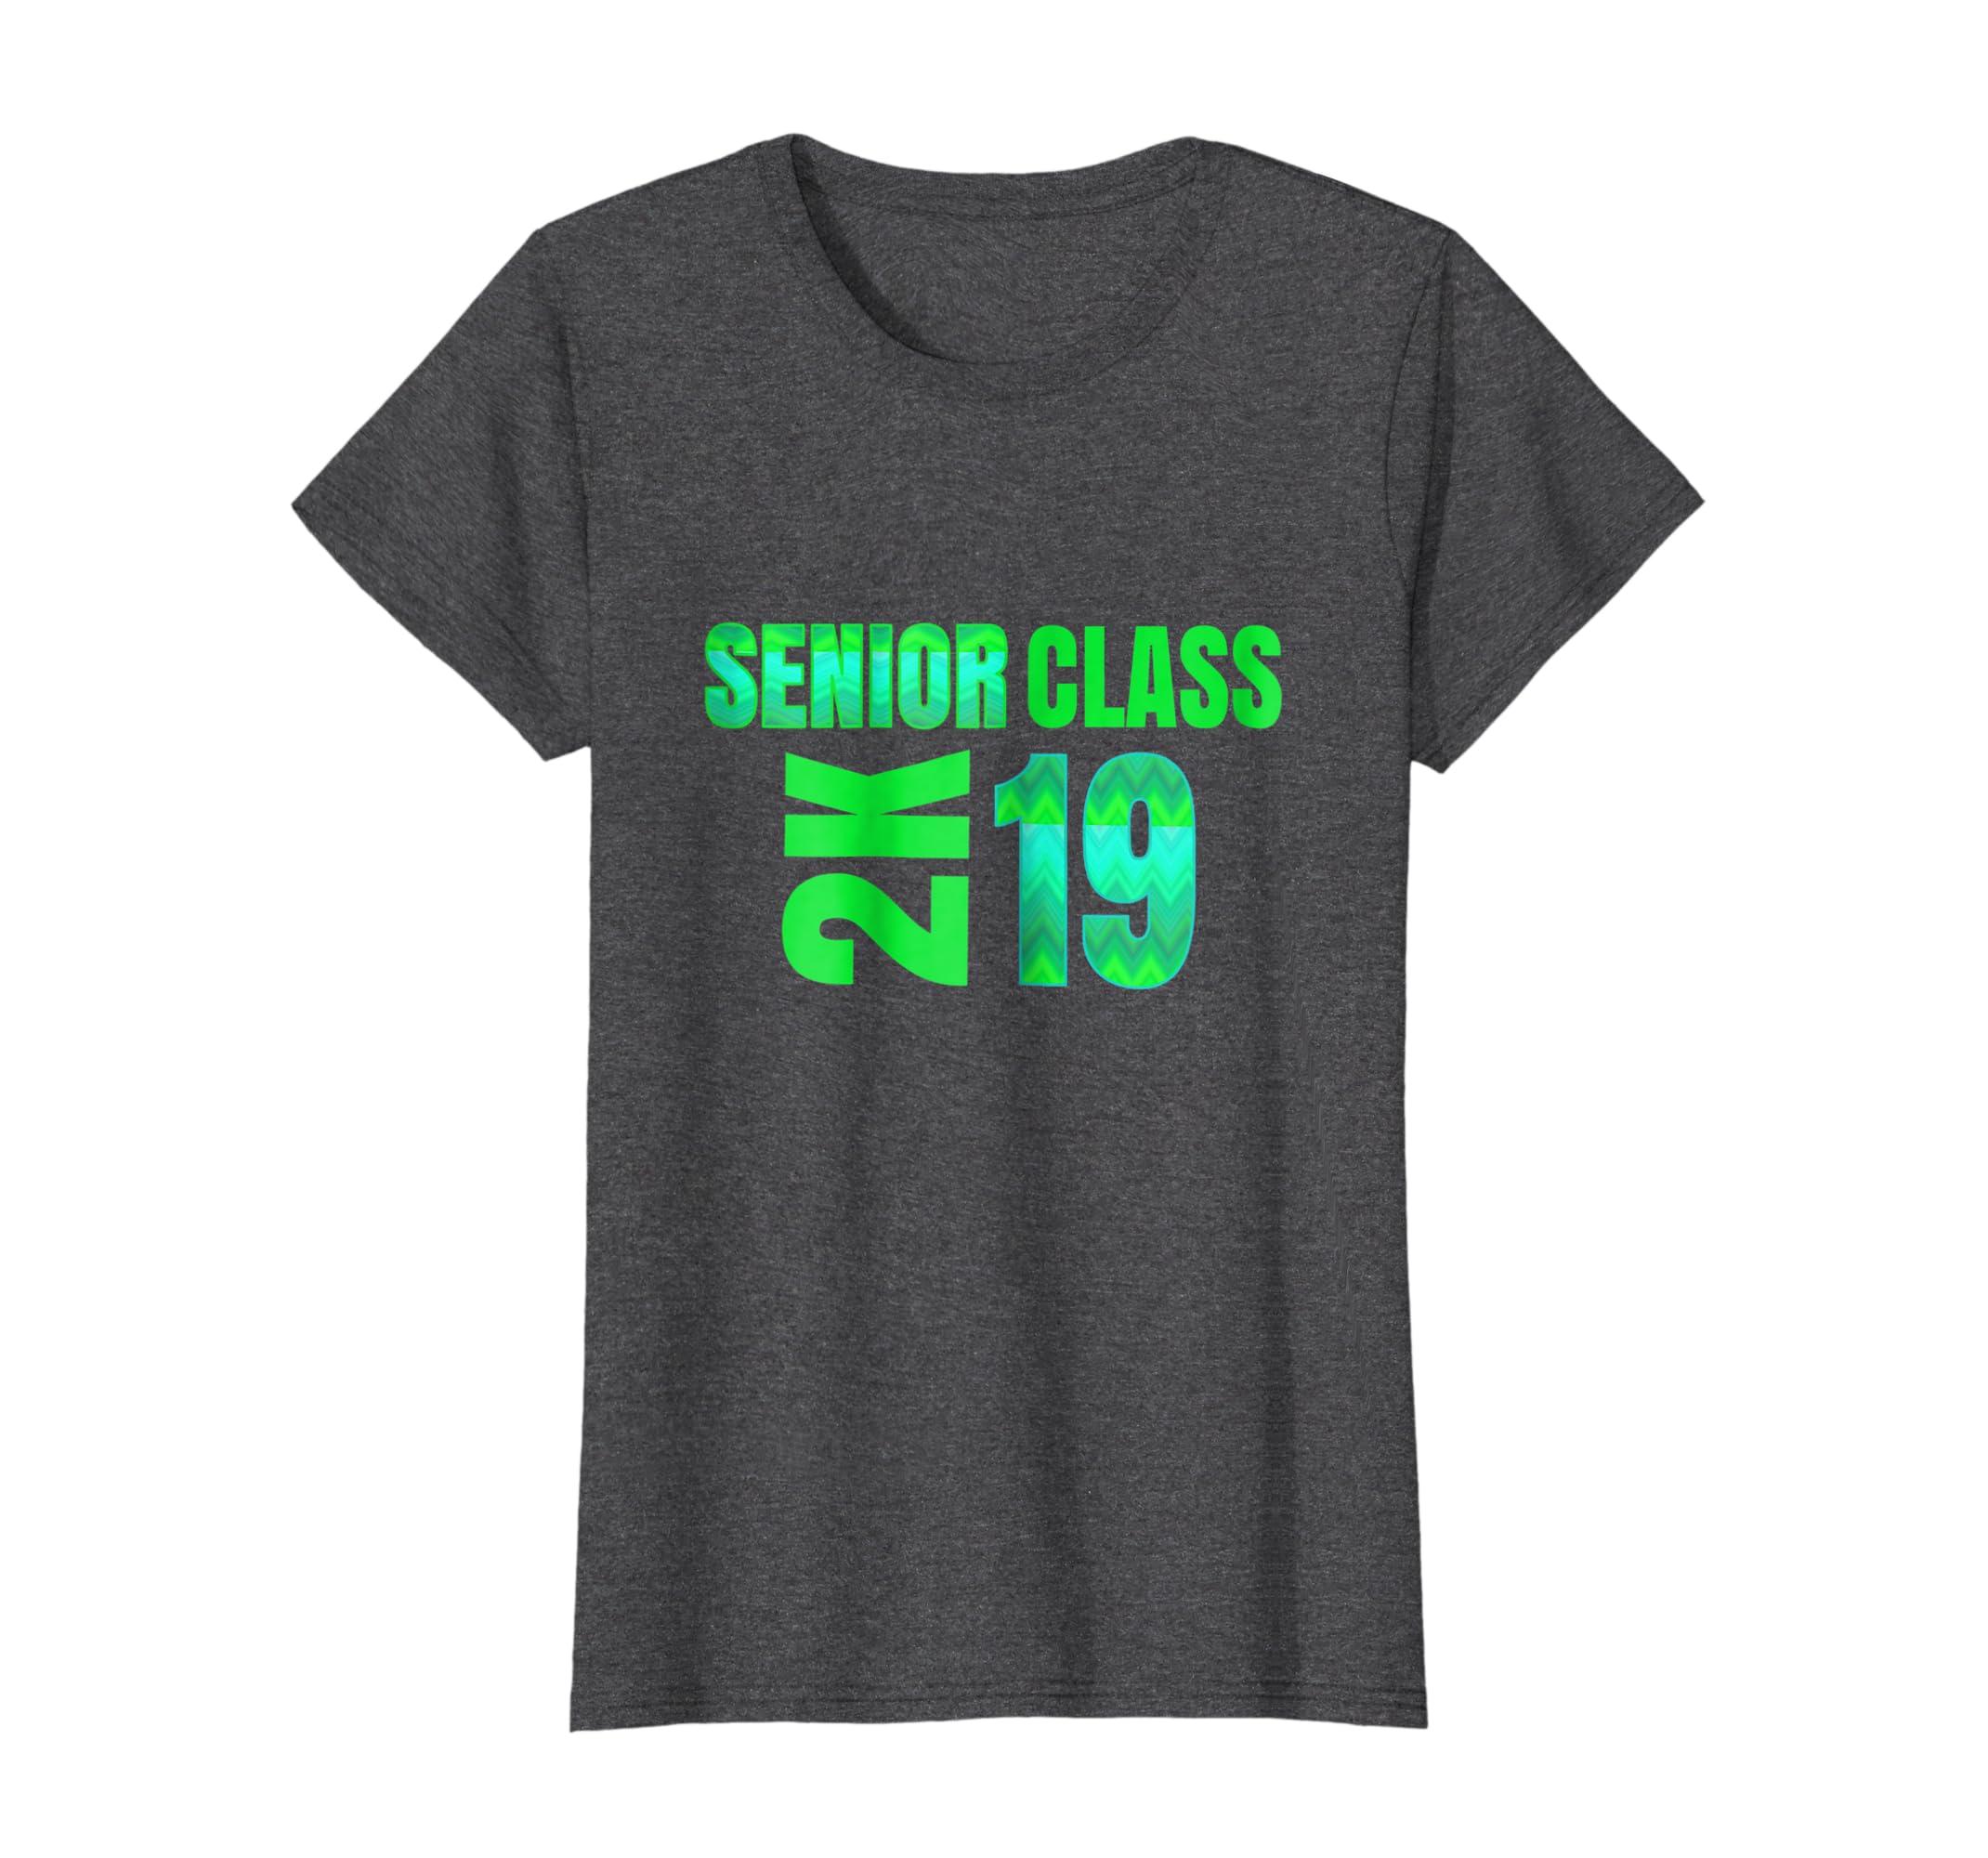 63d01a0b6642 Amazon.com  Senior 2019 Shirts Class Of 2K Cool Graphic Graduate Tee   Clothing